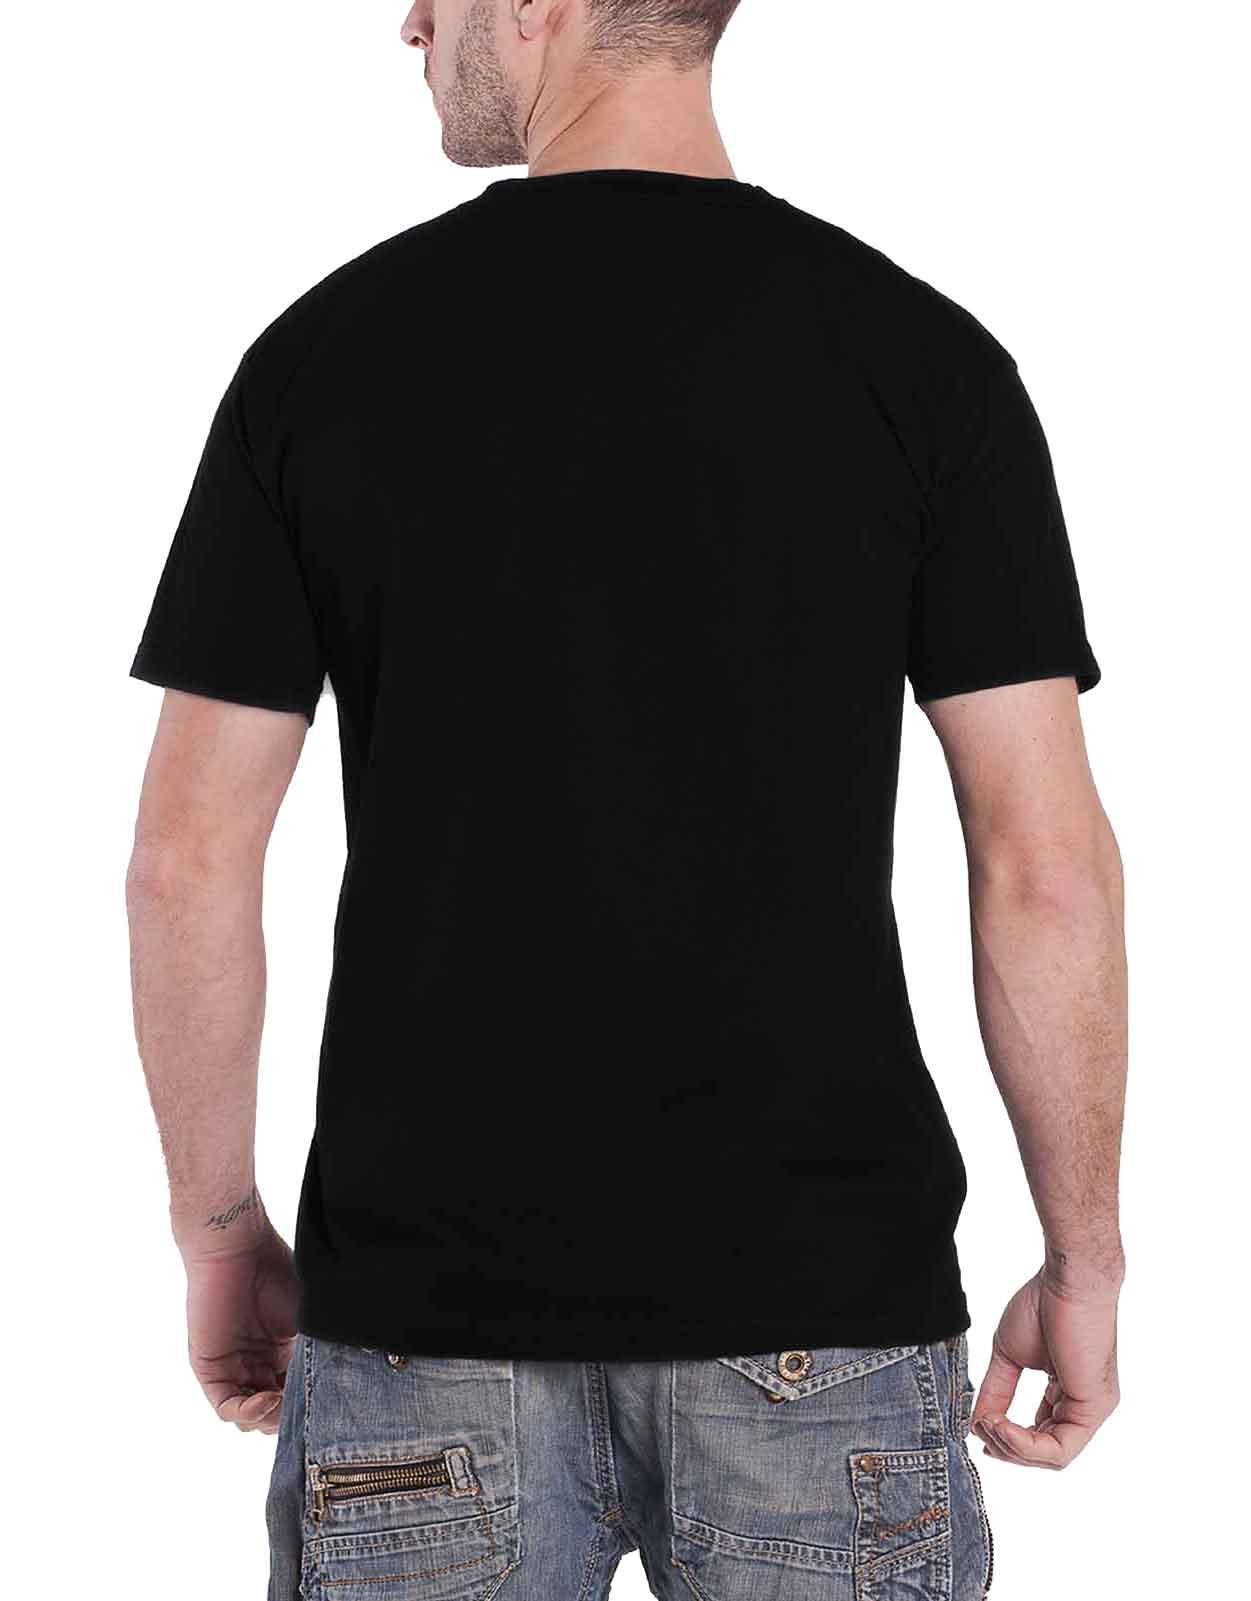 Motorhead-T-Shirt-Lemmy-RIP-England-warpig-clean-your-clock-official-new-mens Indexbild 35